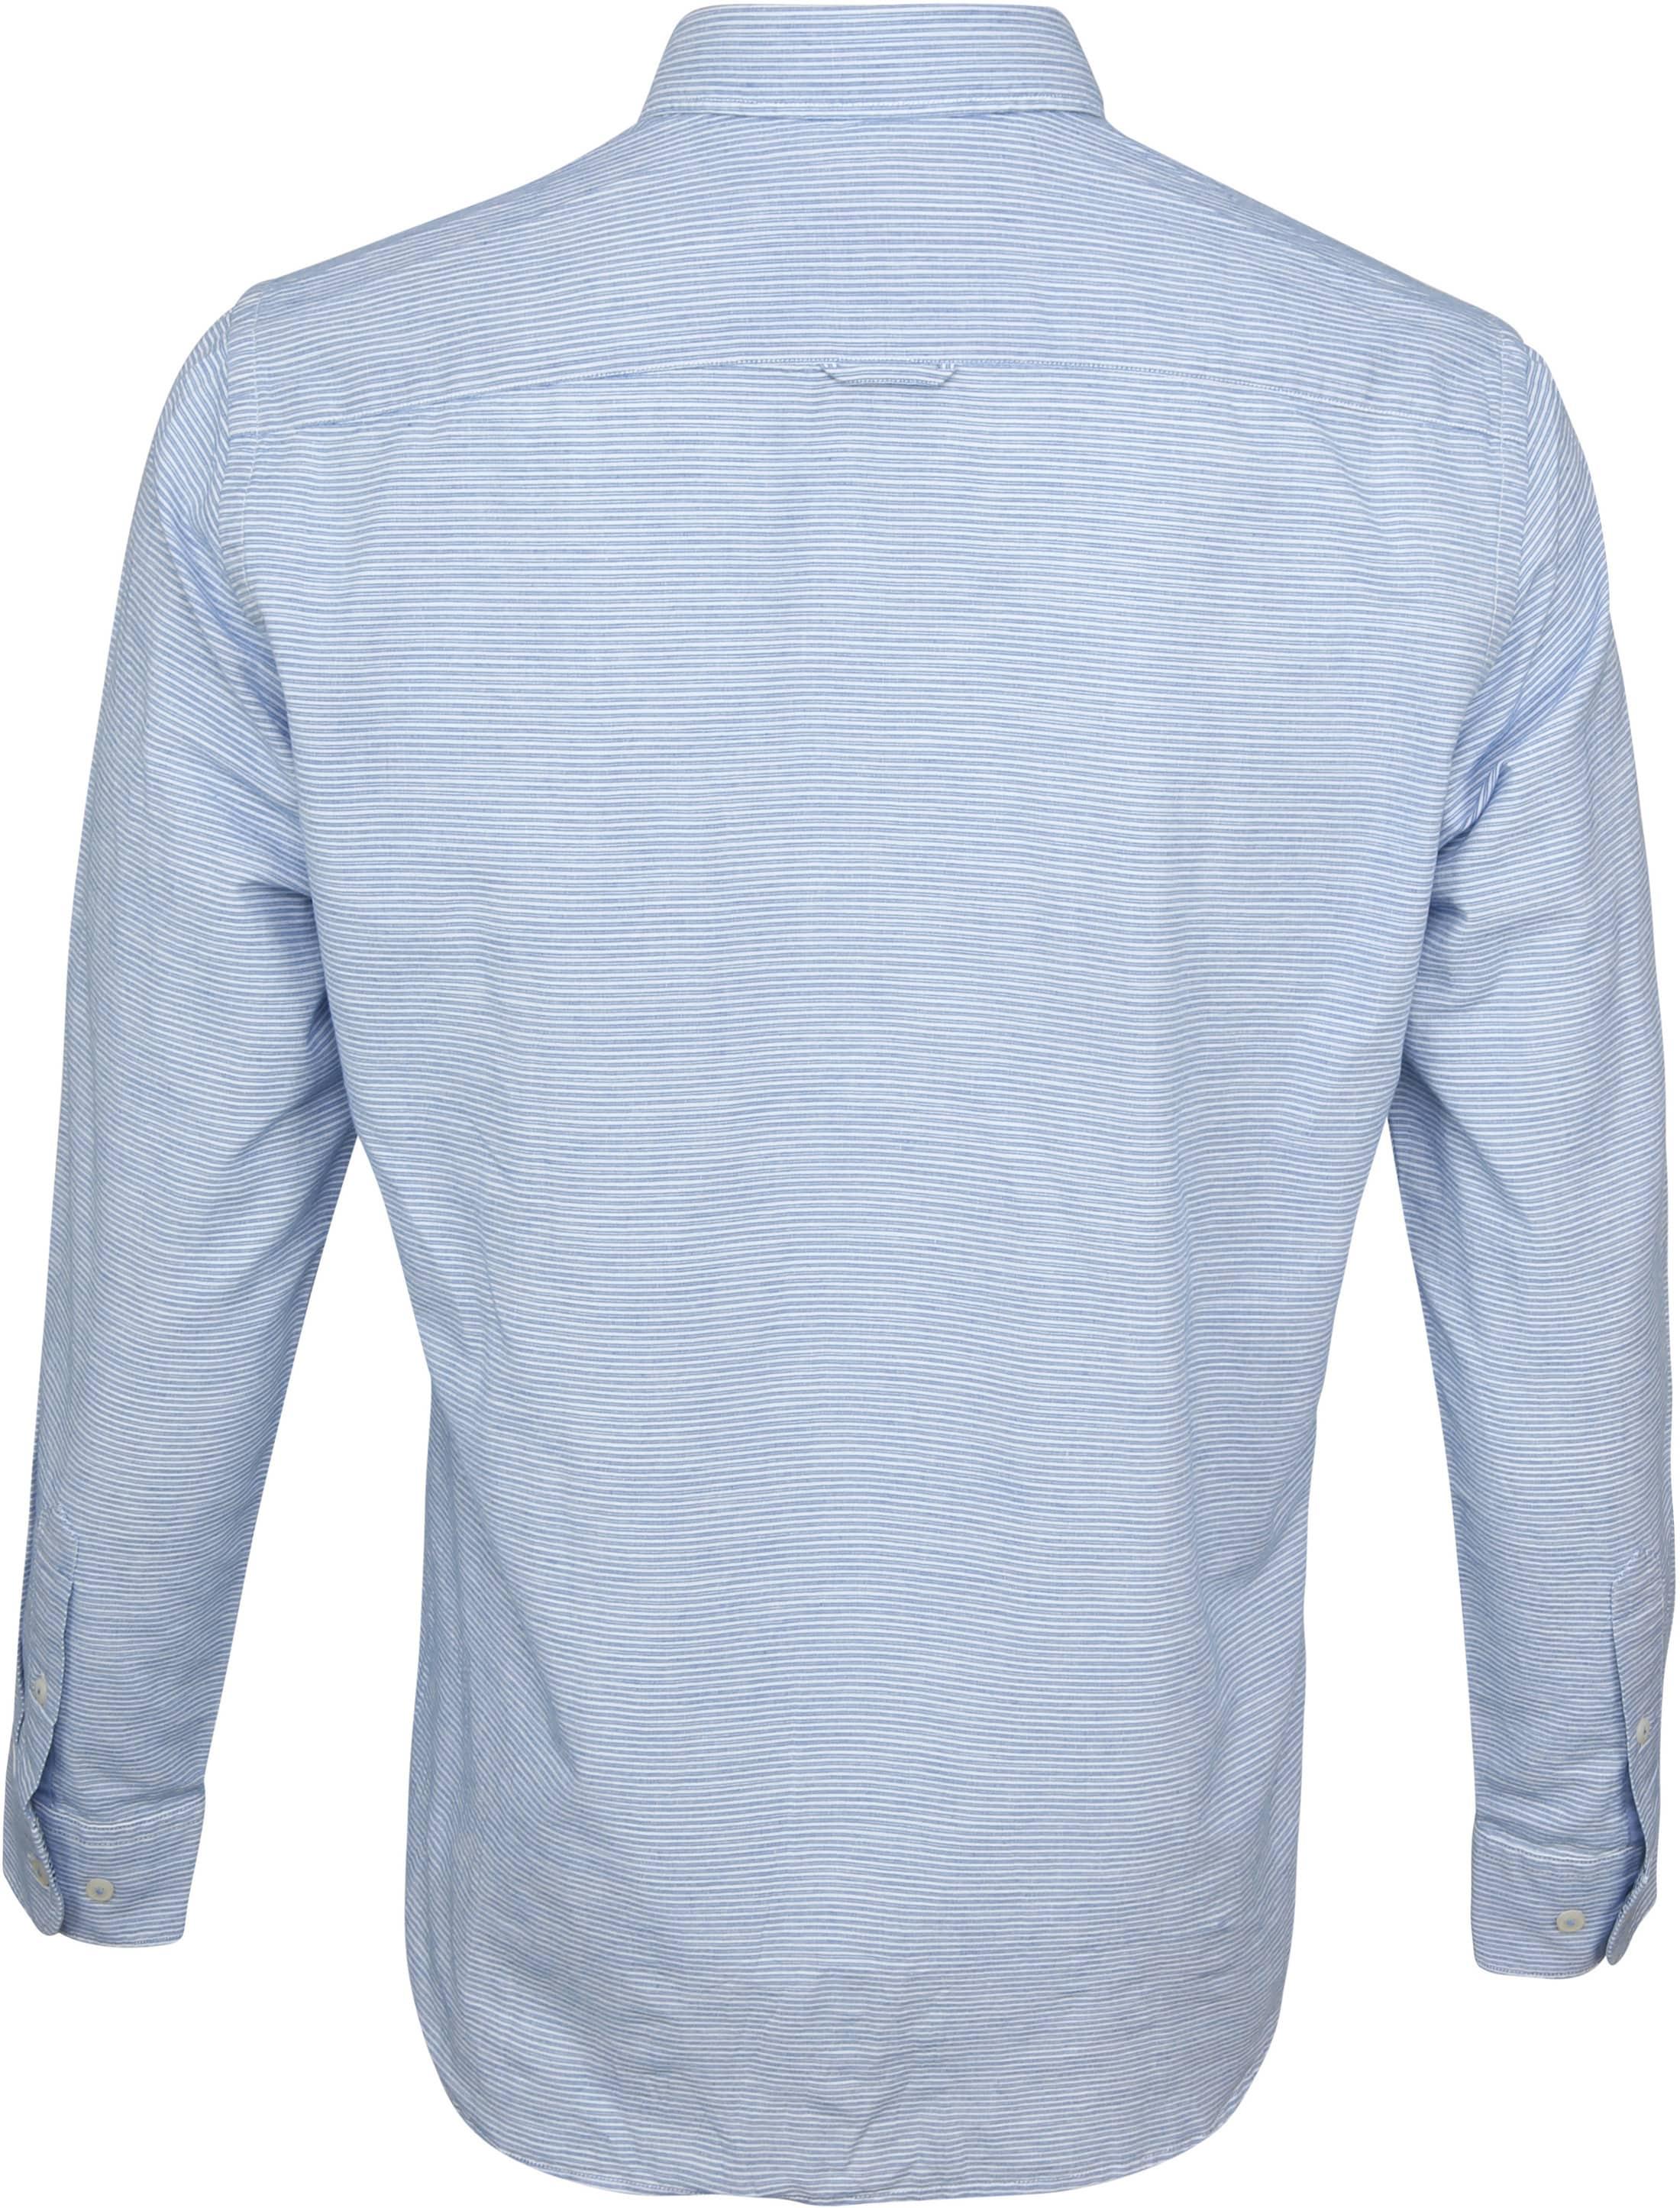 Marc O'Polo Overhemd Strepen Blauw foto 3